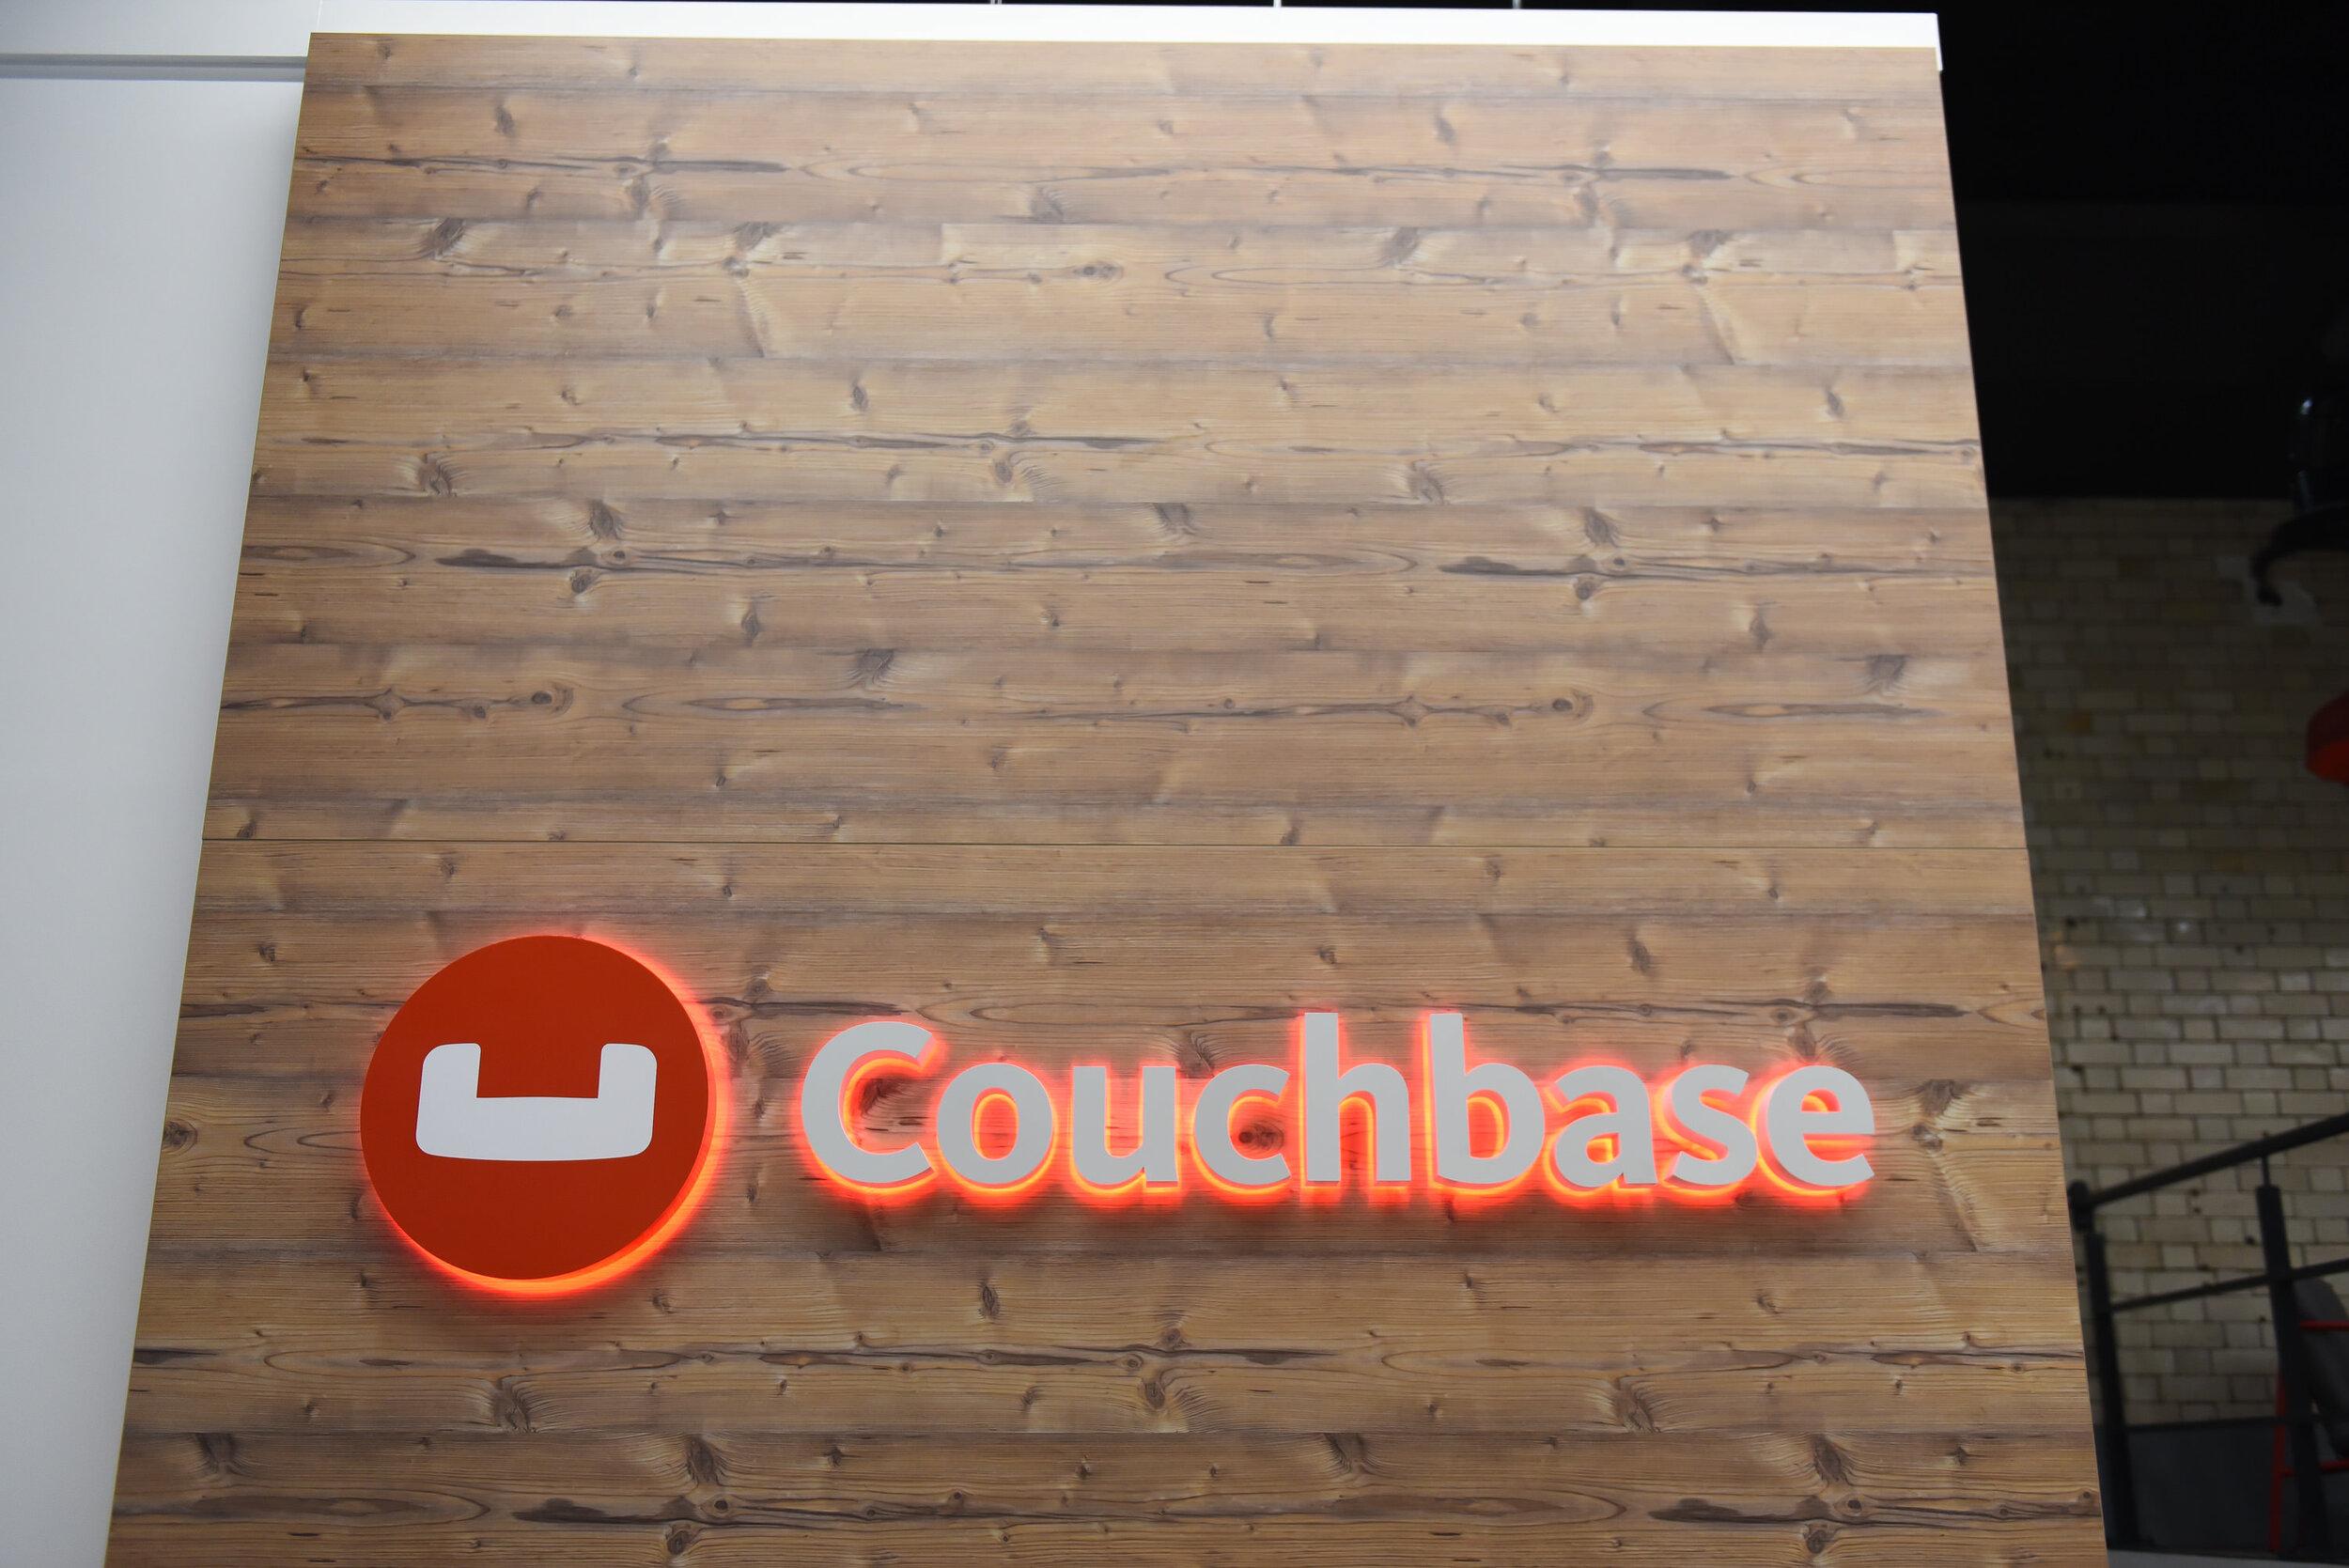 Couchbase_officelaunch_1.jpg